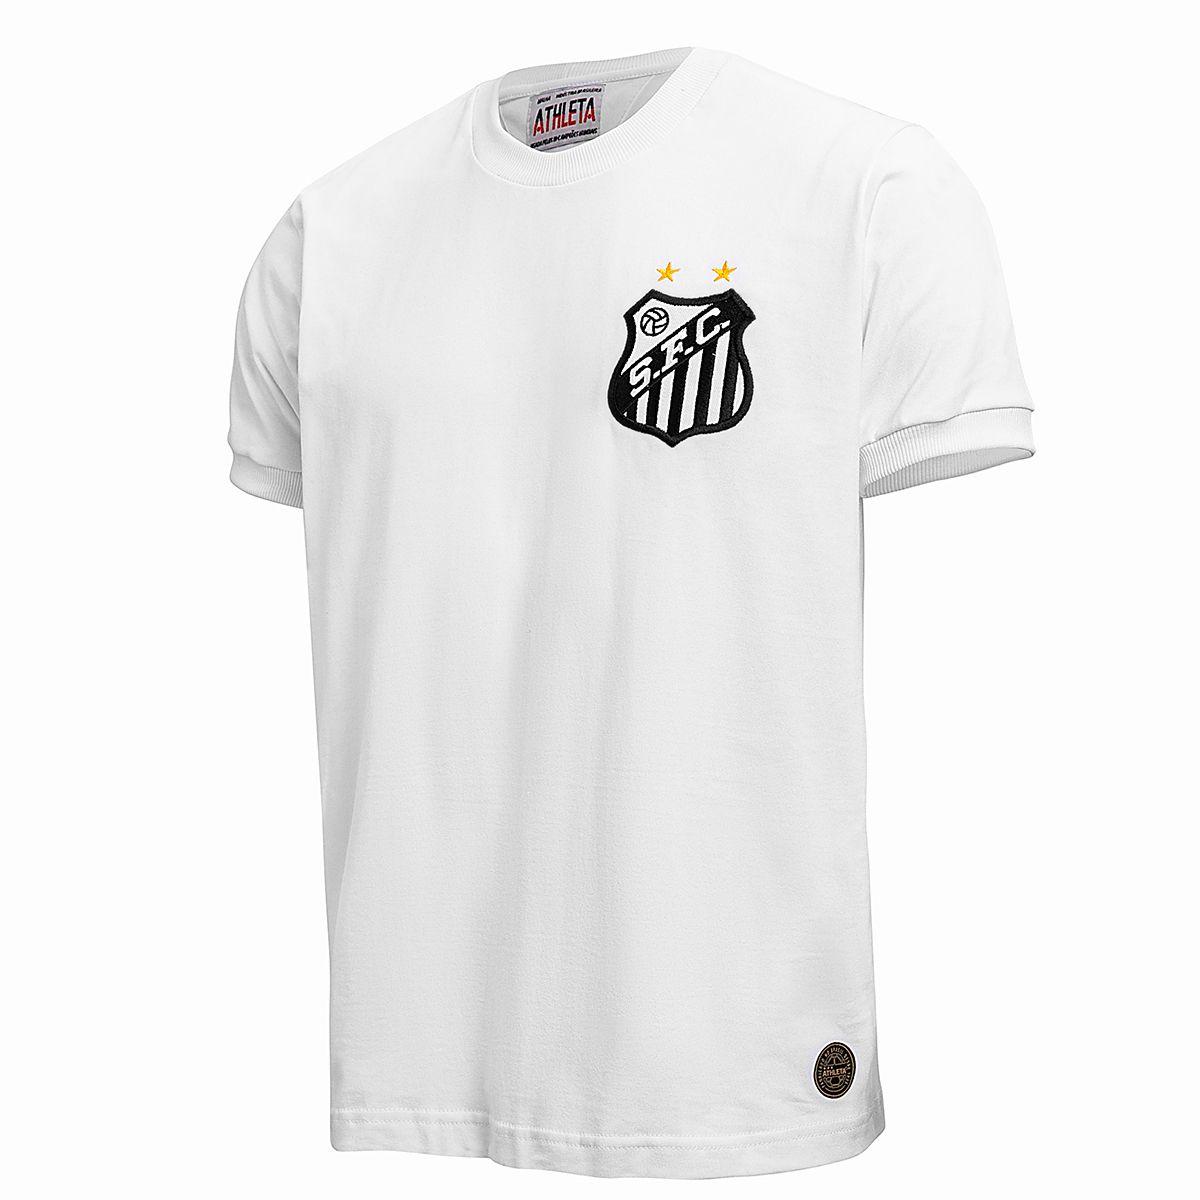 Camisa Santos Retrô 1969 Milésimo Gol Pelé Masculina